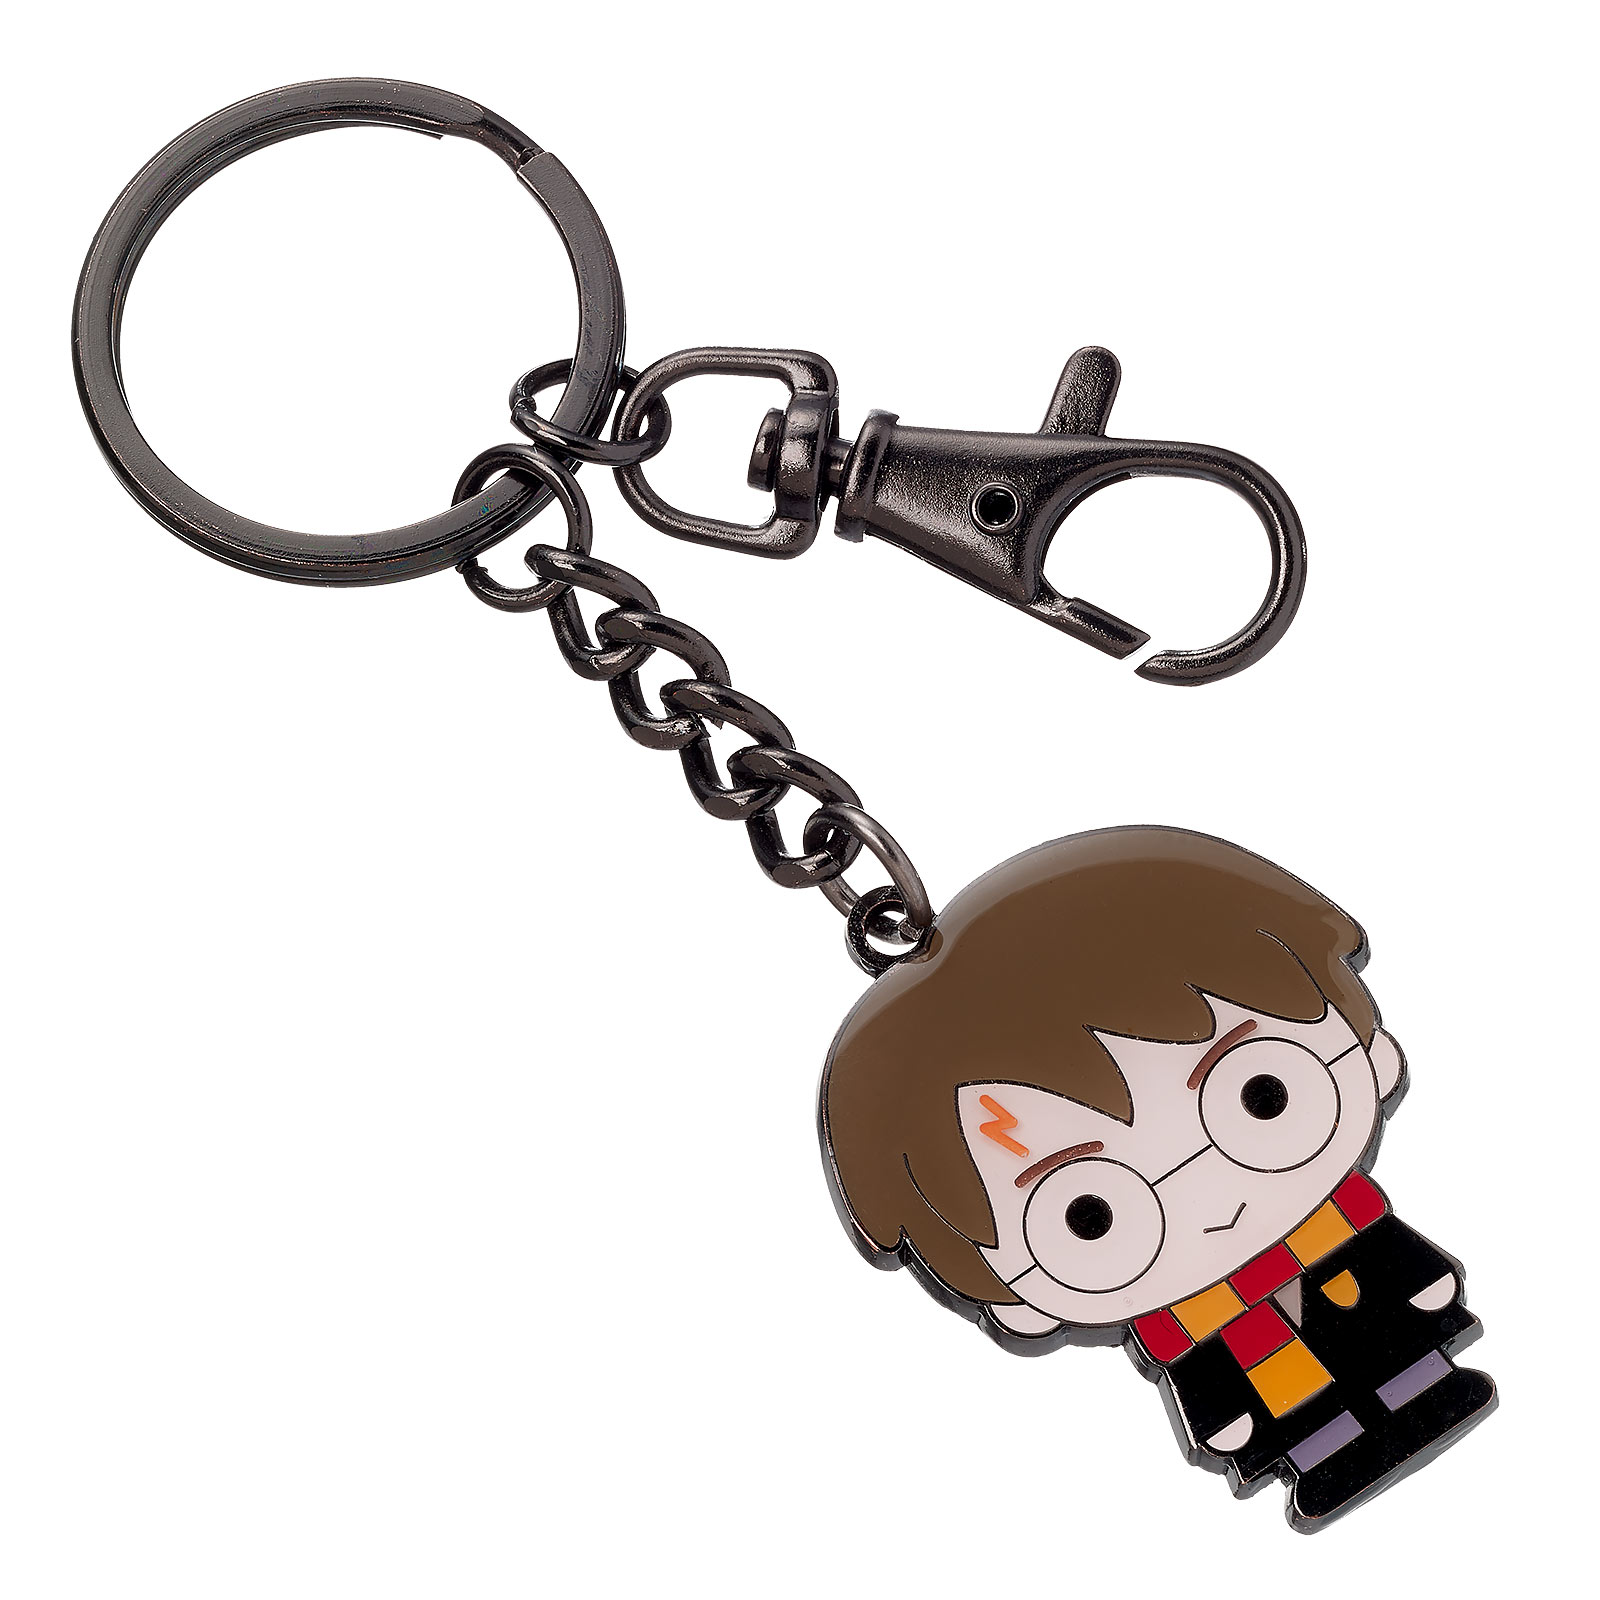 Harry Potter - Chibi Schlüsselanhänger